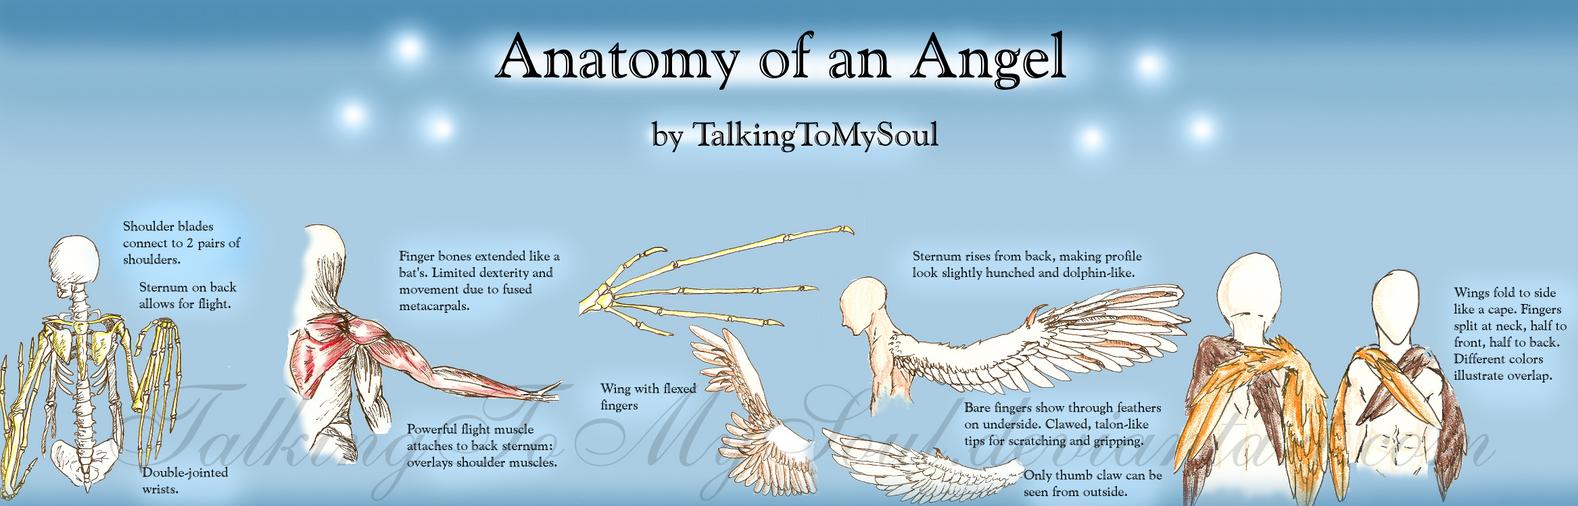 anatomy of an angel by TalkingToMySoul